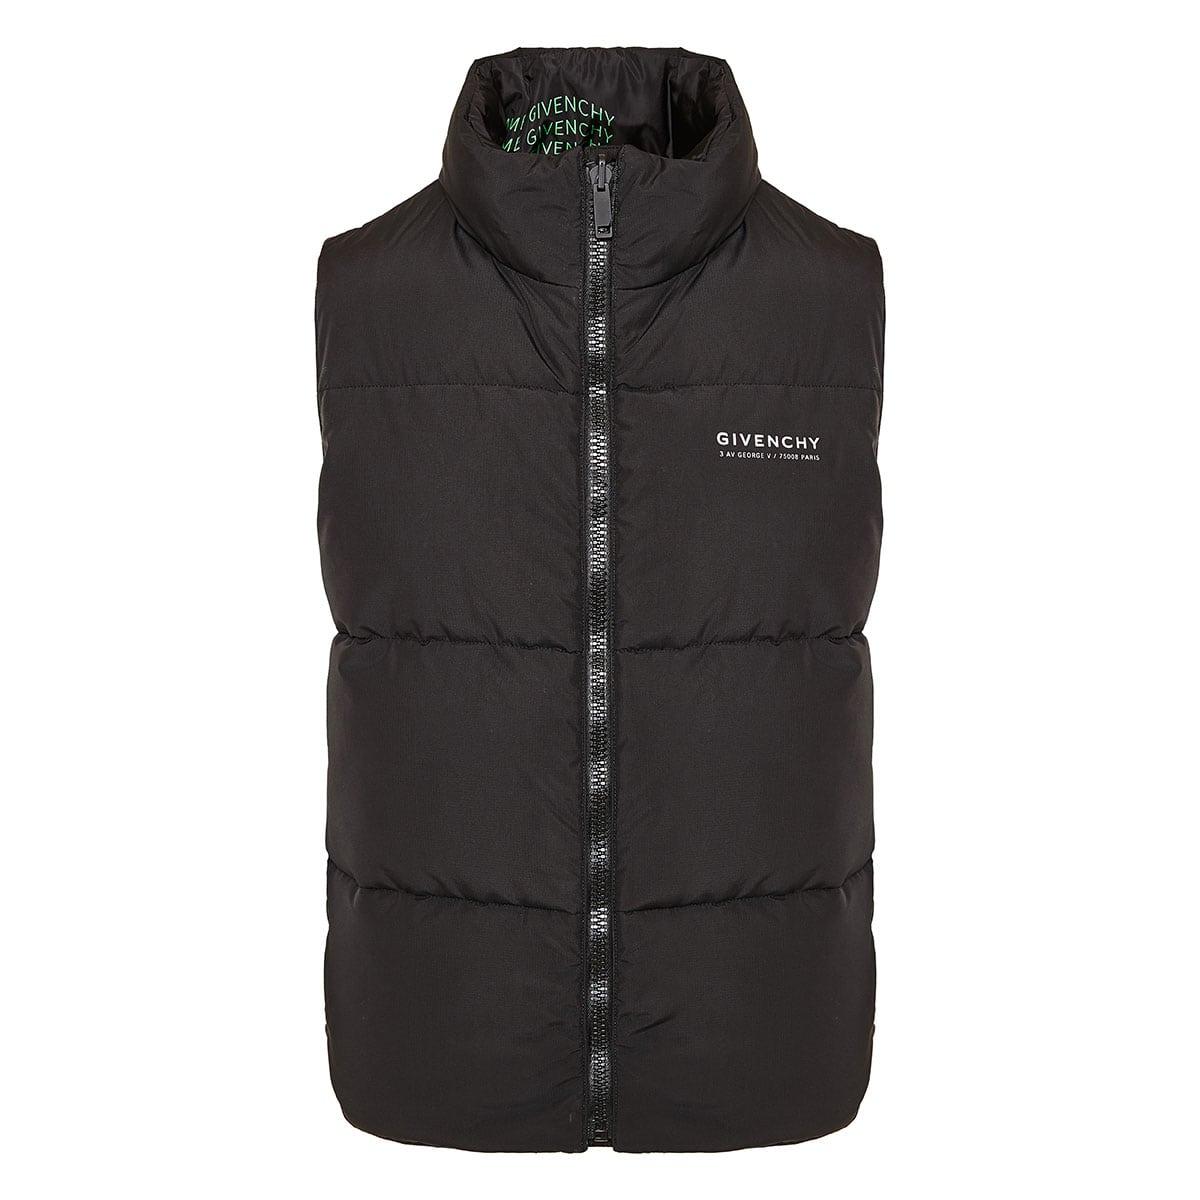 Studio Homme Givenchy reversible vest